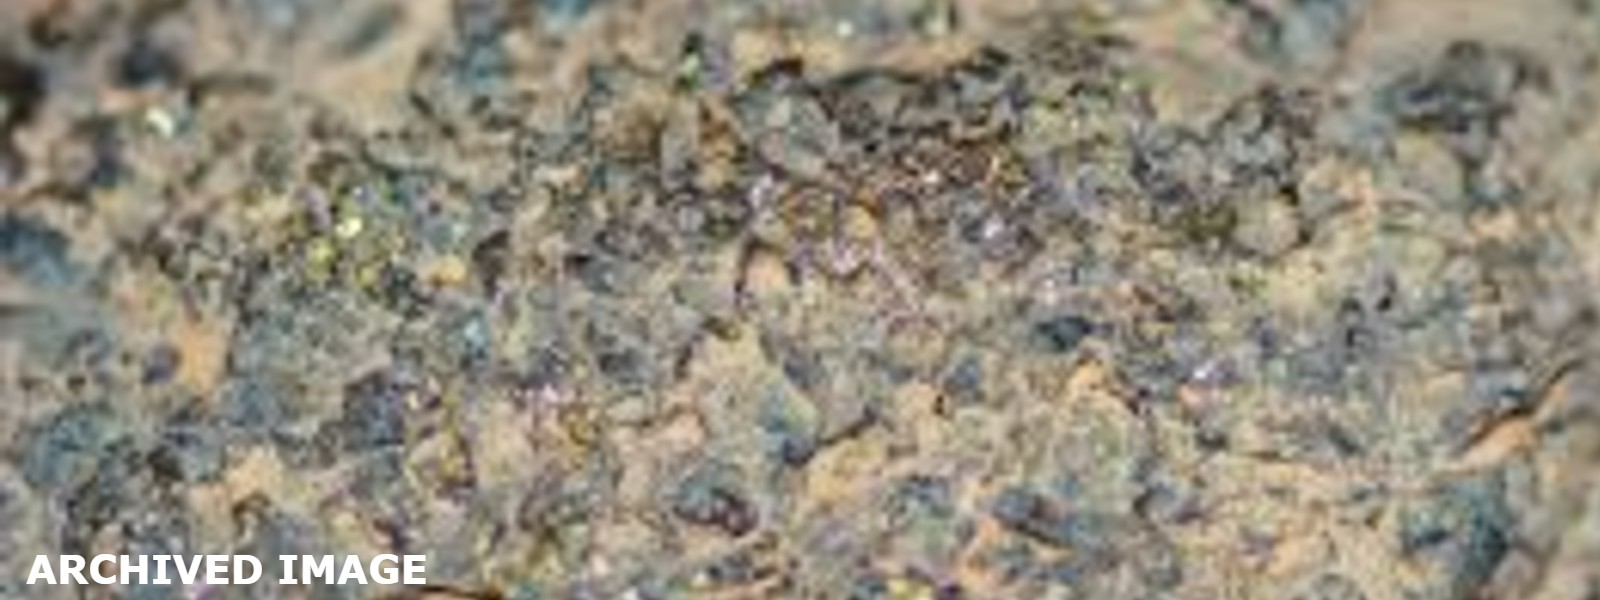 Committee to explore gold, copper & iron ore in Seruwawila